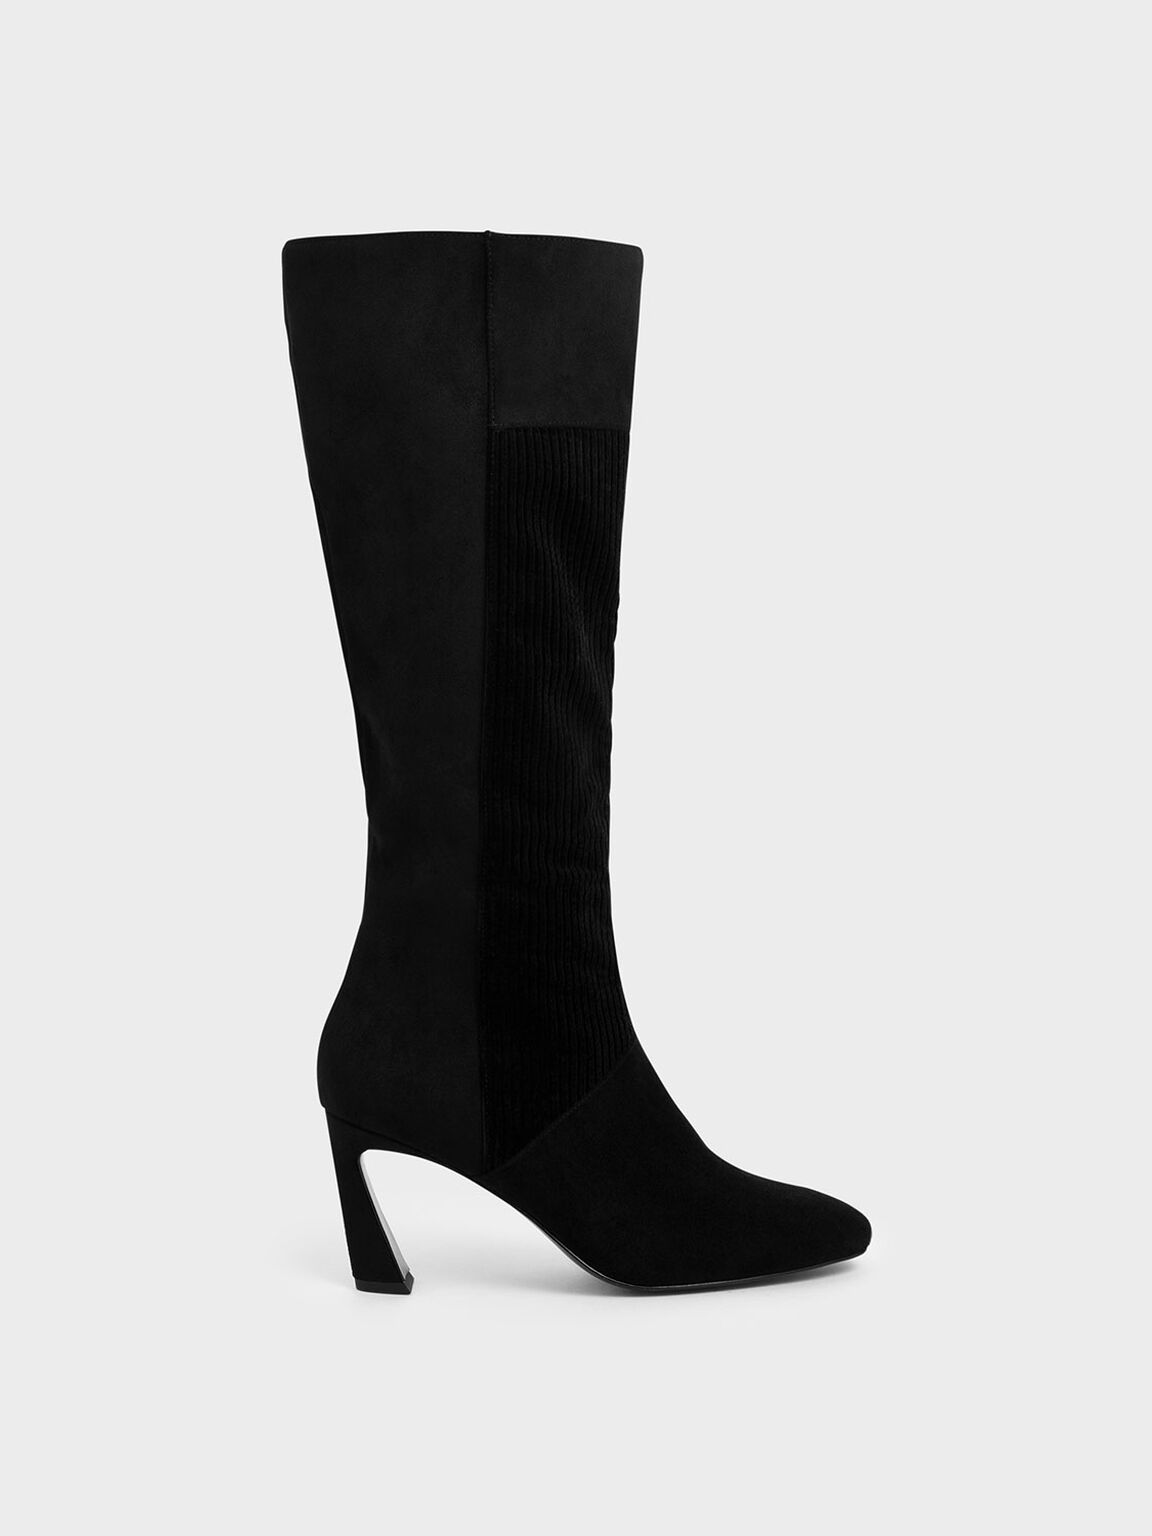 Corduroy Sculptural Heel Knee High Boots, Black, hi-res